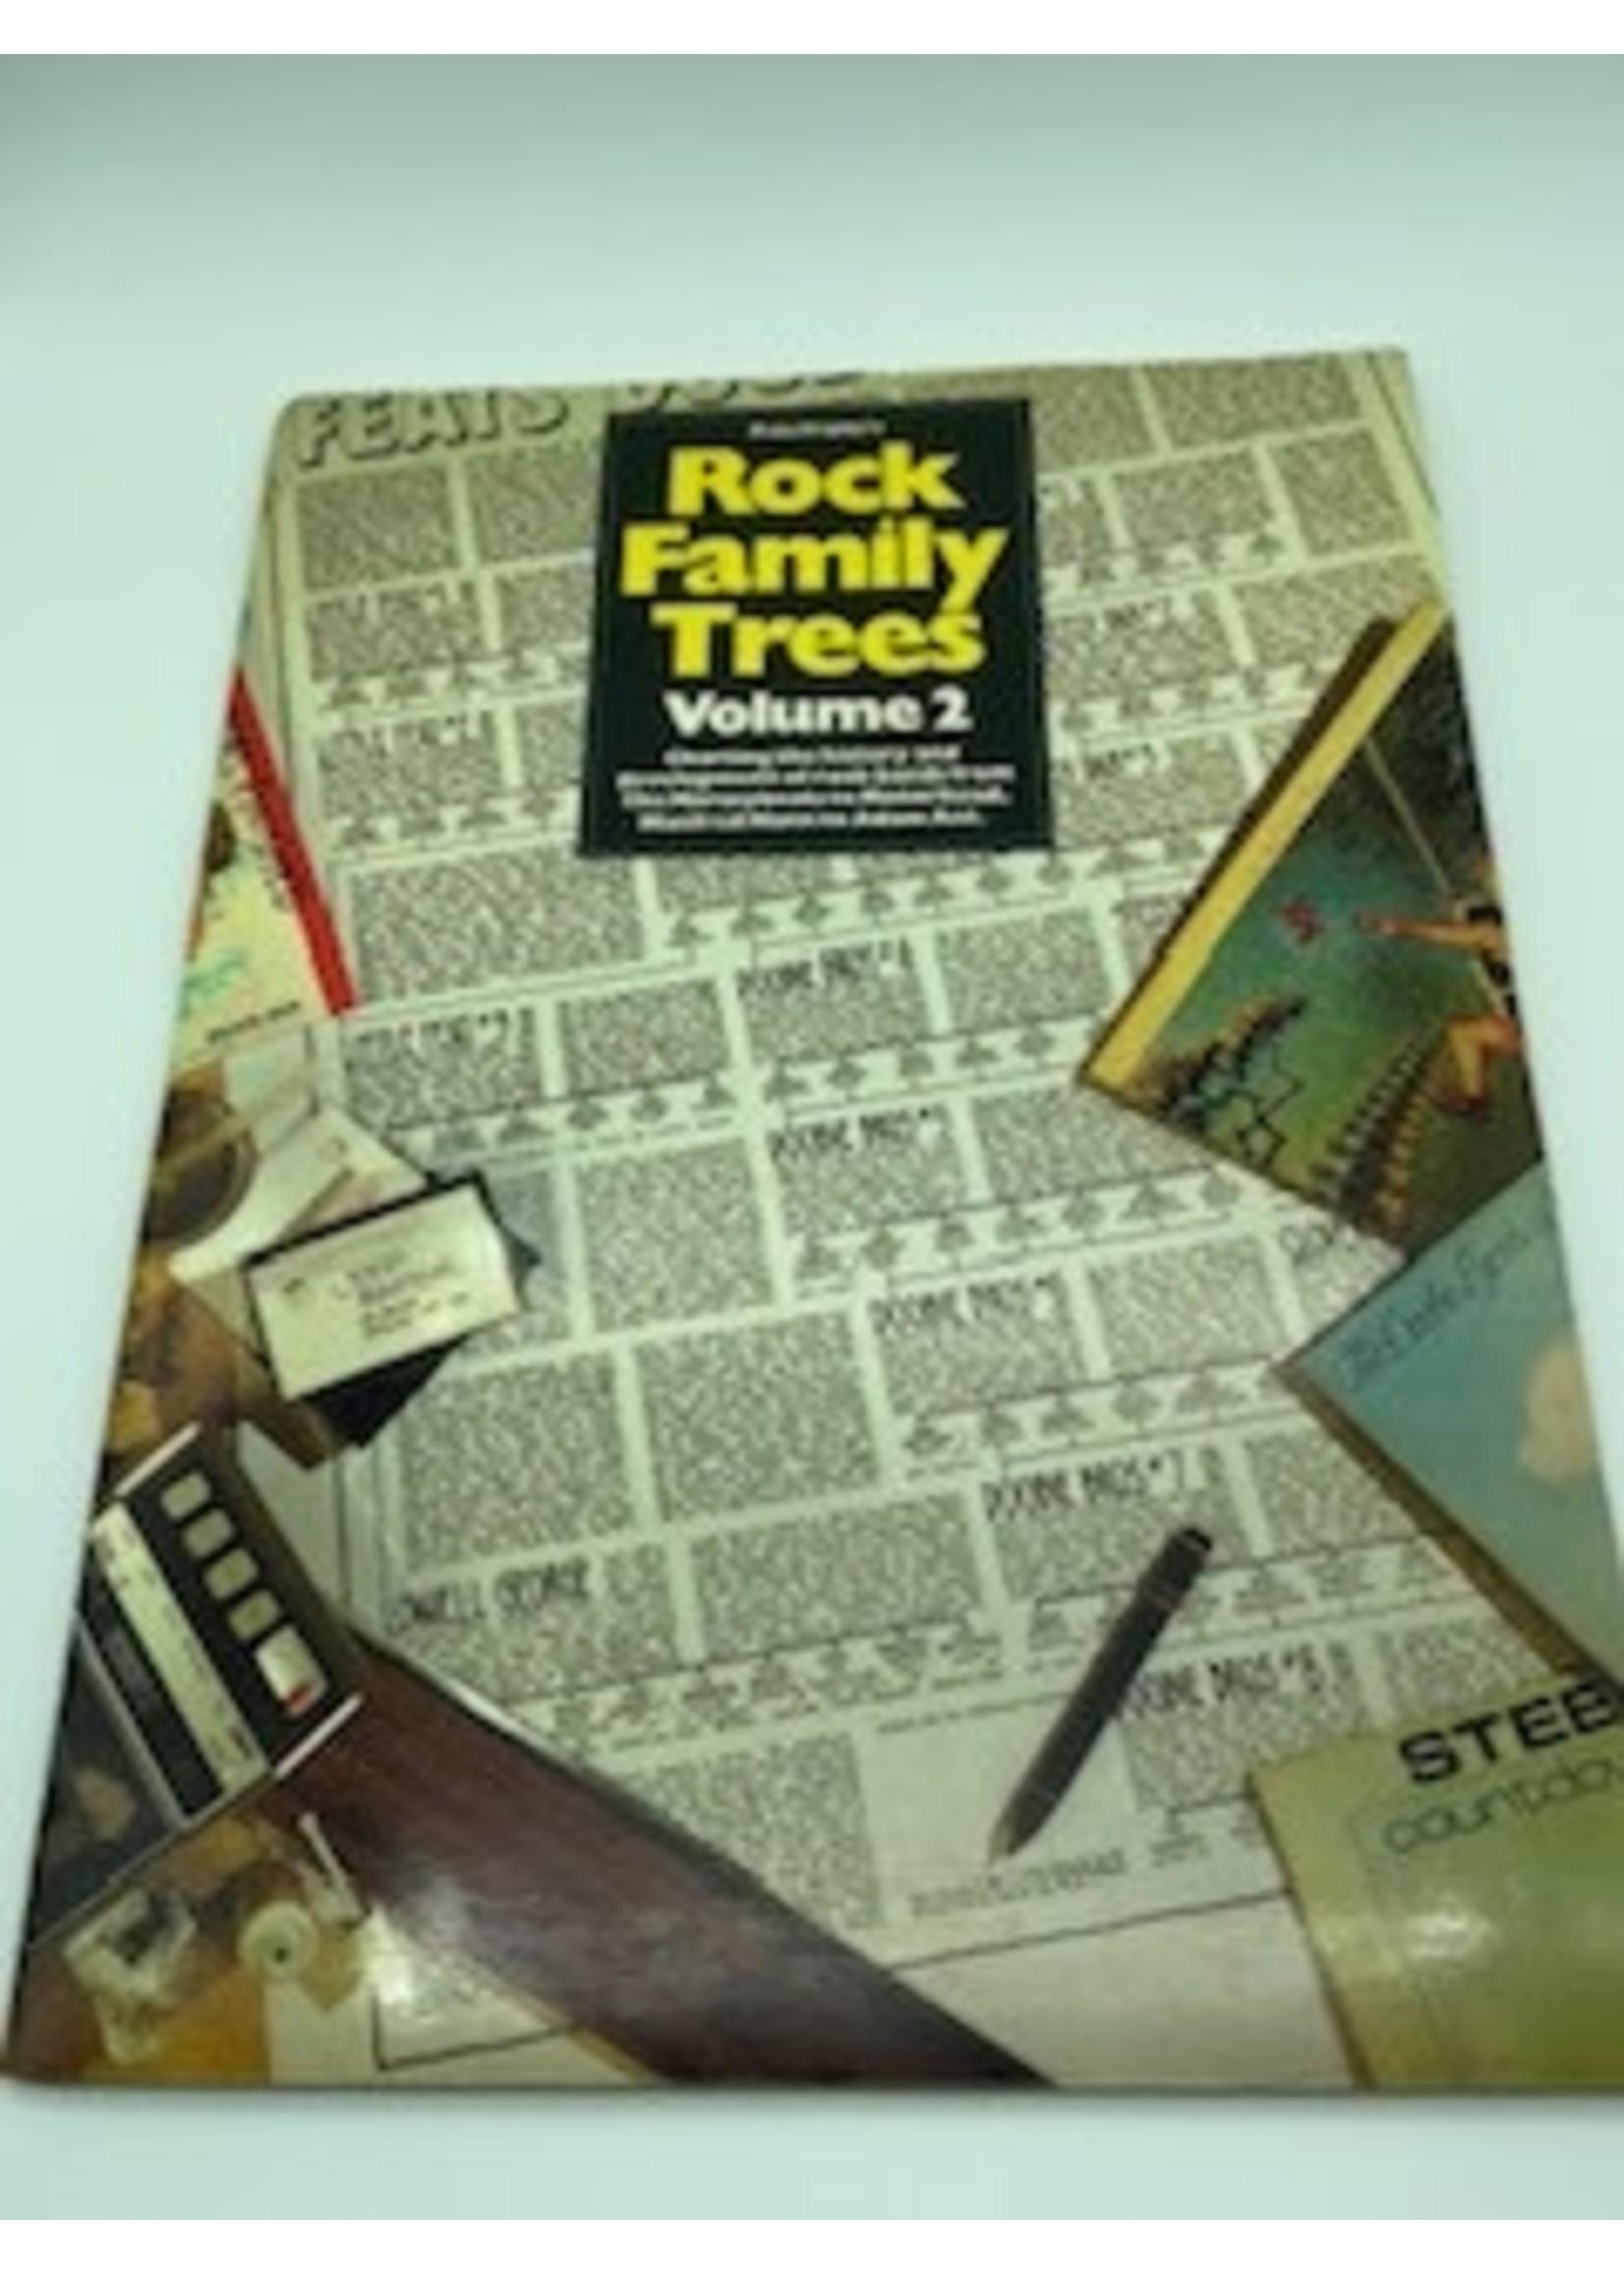 Pete Frame's Rock Family Trees: Volume 2